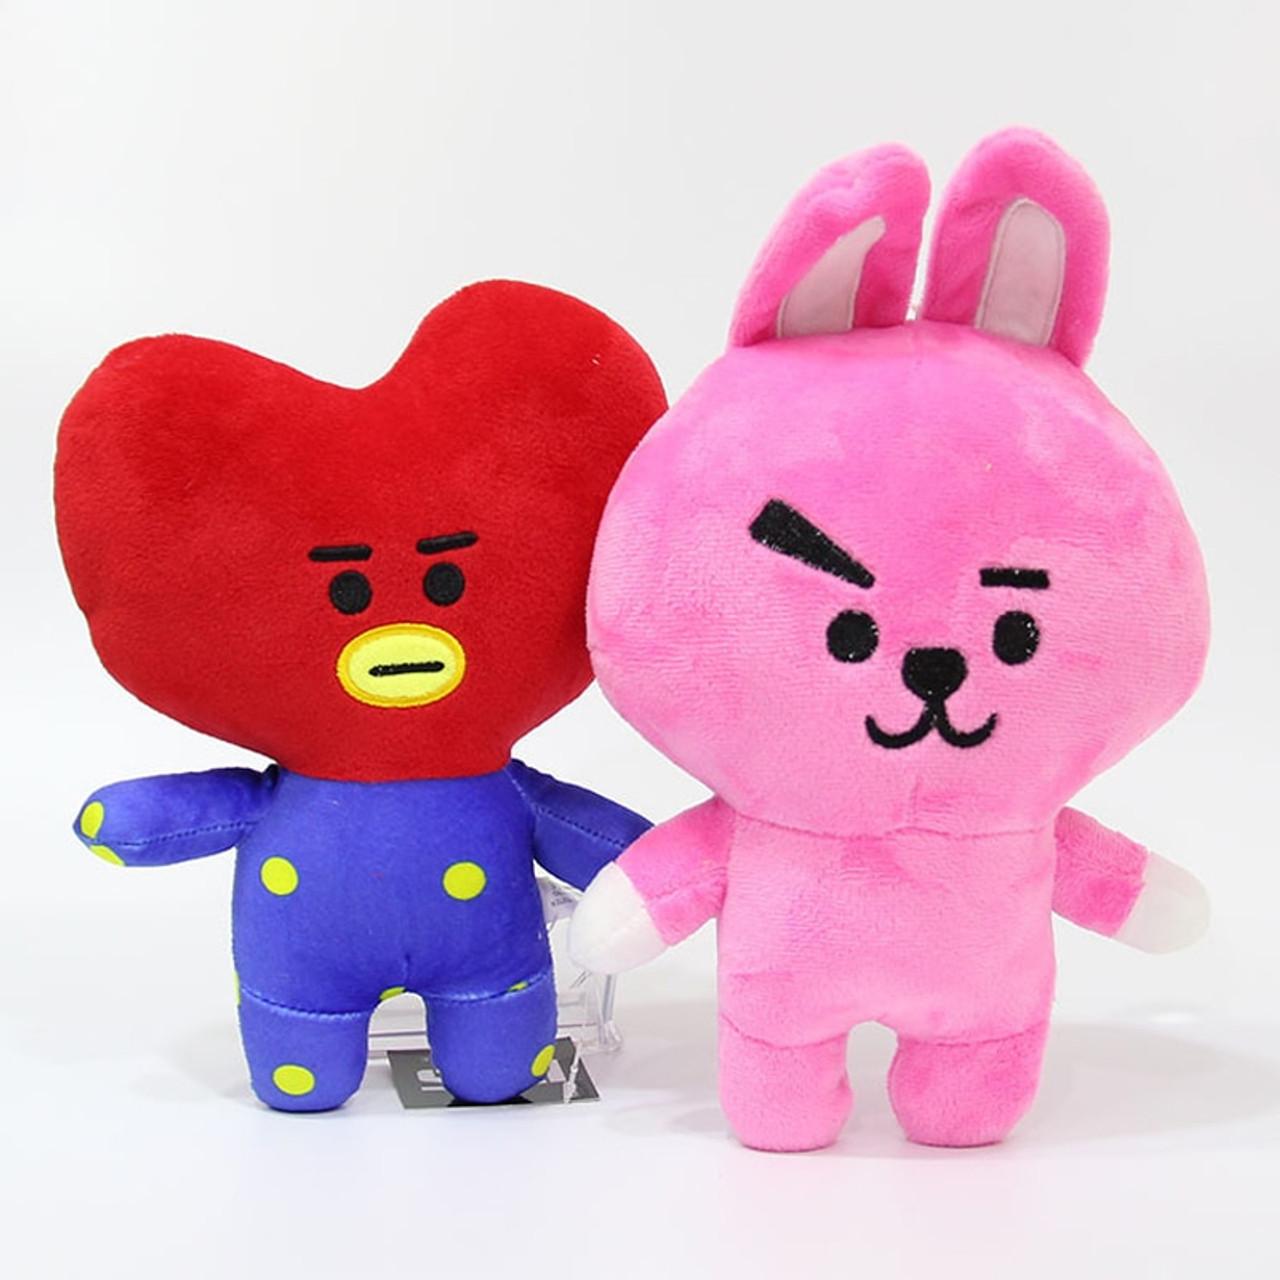 20cm Kpop Bangtan Boys BTS BT21 Plush Toys Doll Tata Van Cooky Chimmy Shooky Koya MANG Plush ...